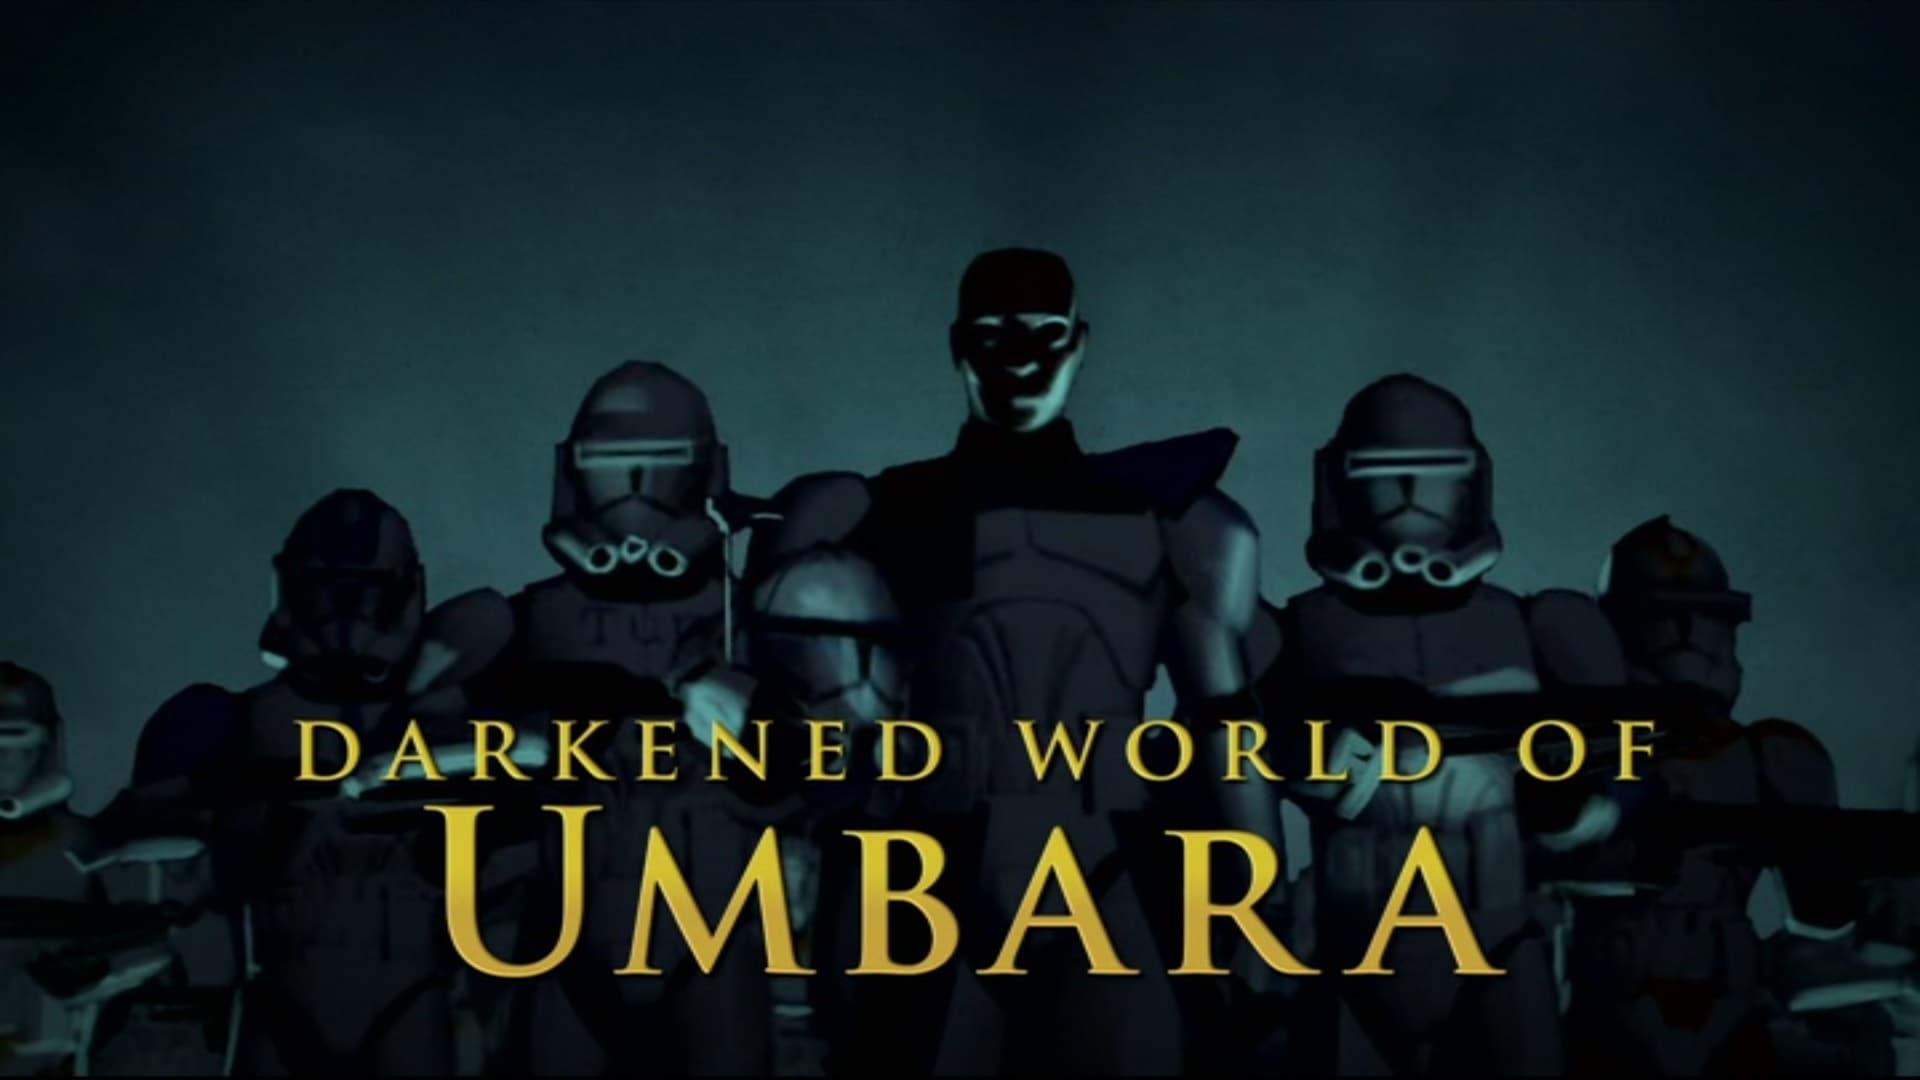 Star Wars: The Clone Wars - Season 0 Episode 114 : Darkened World of Umbara Video Commentary